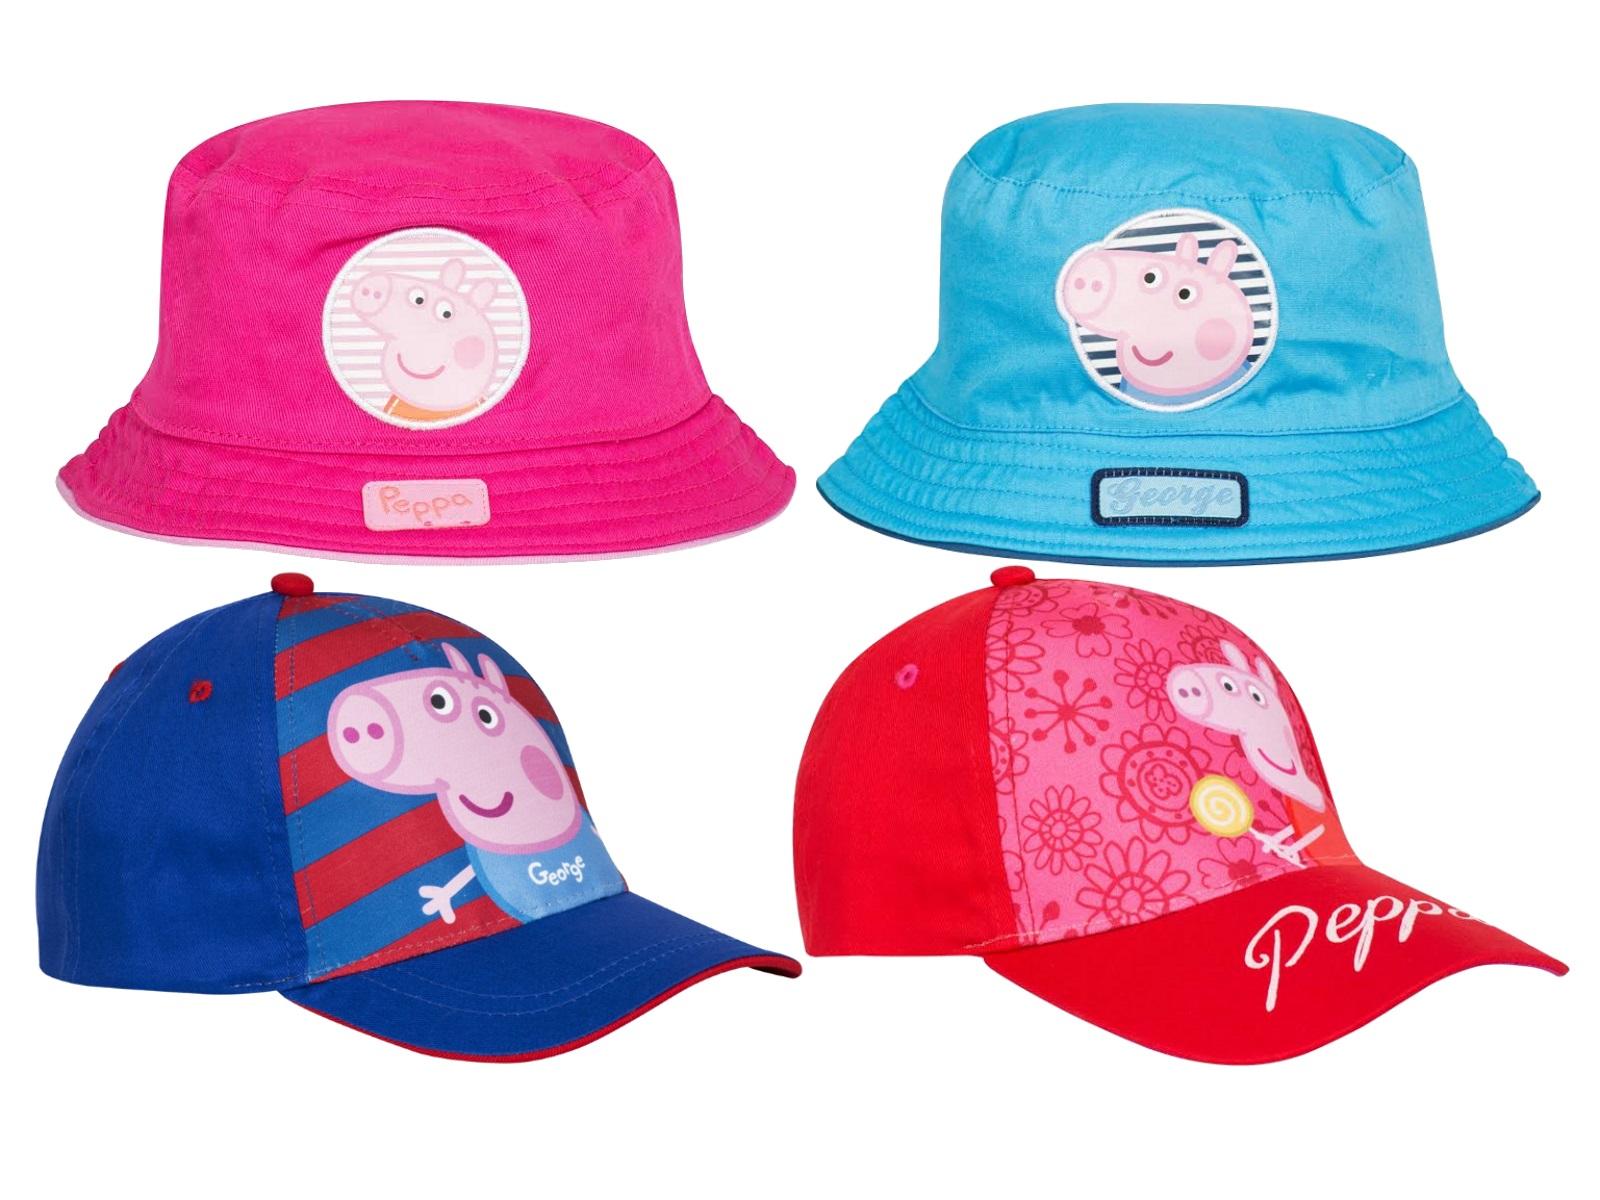 Boys Girls Peppa Pig Sun Hat George Summer Baseball Peak Cap Childrens Size  S-XL b458eab6753